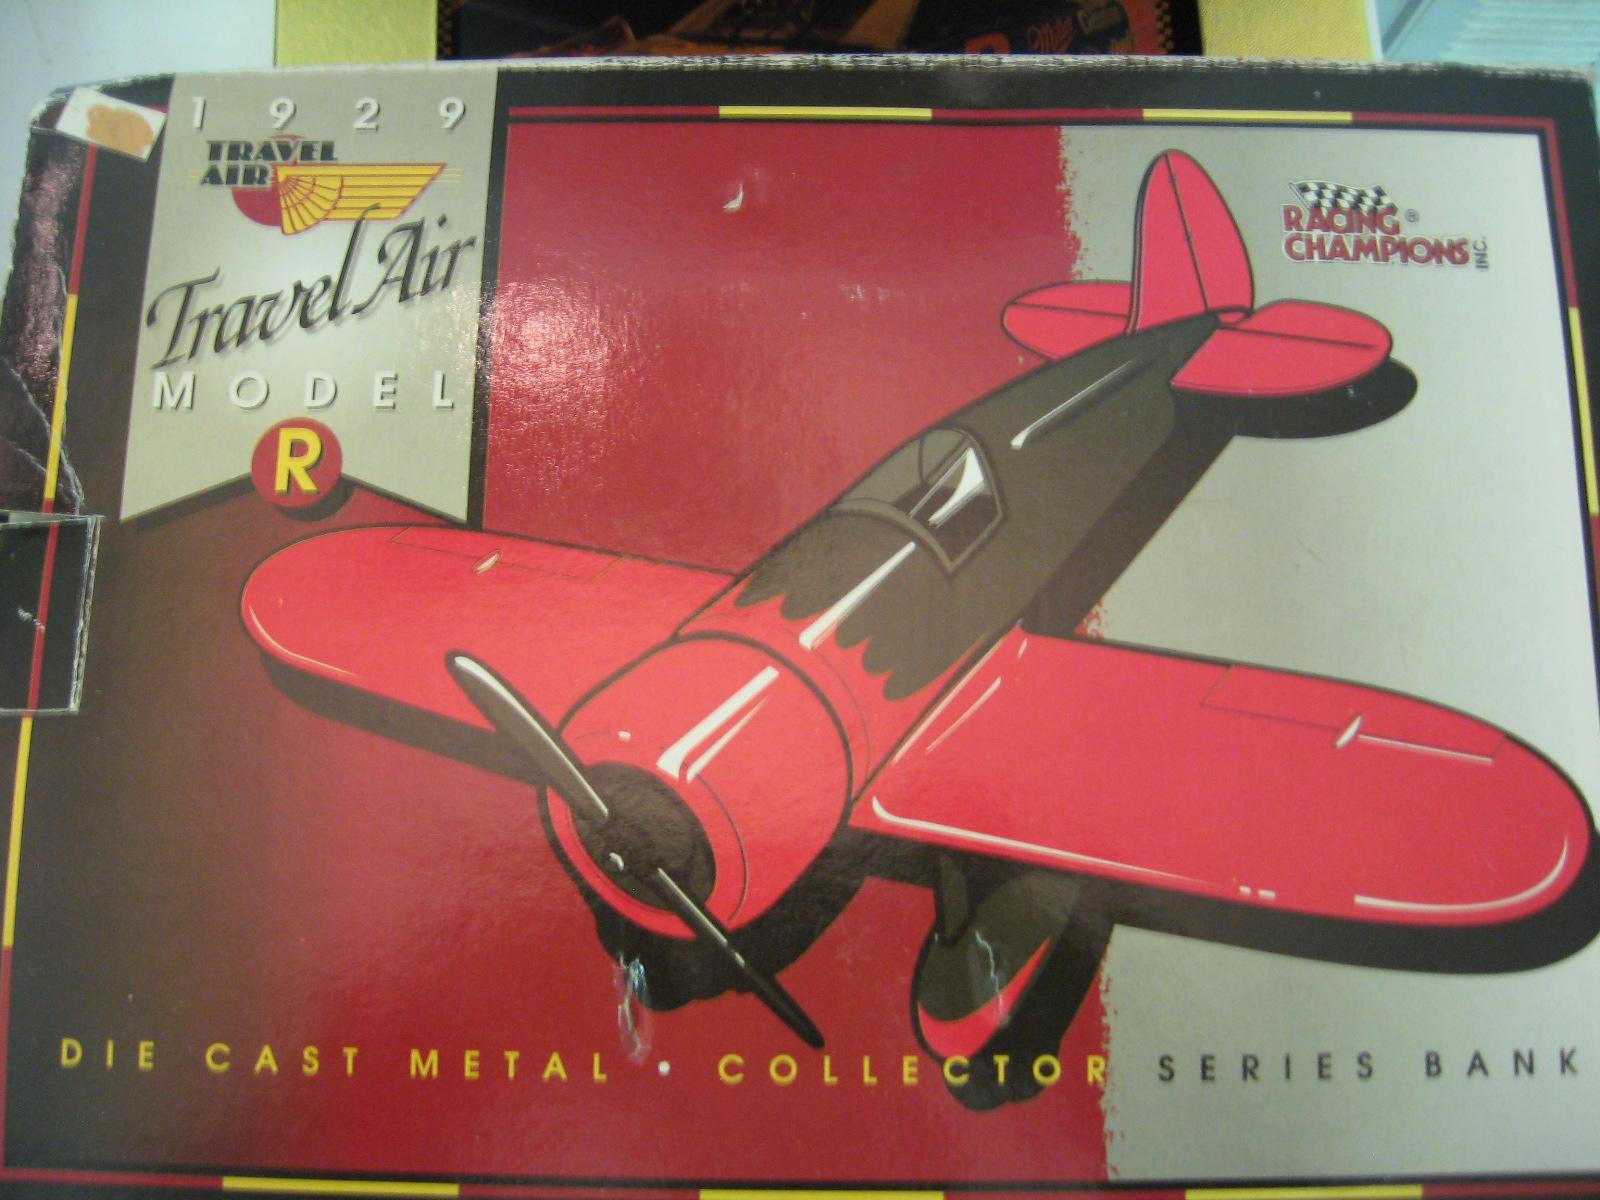 1929 Travel Air Model R Plane Bank – Rusty Wallace Edition